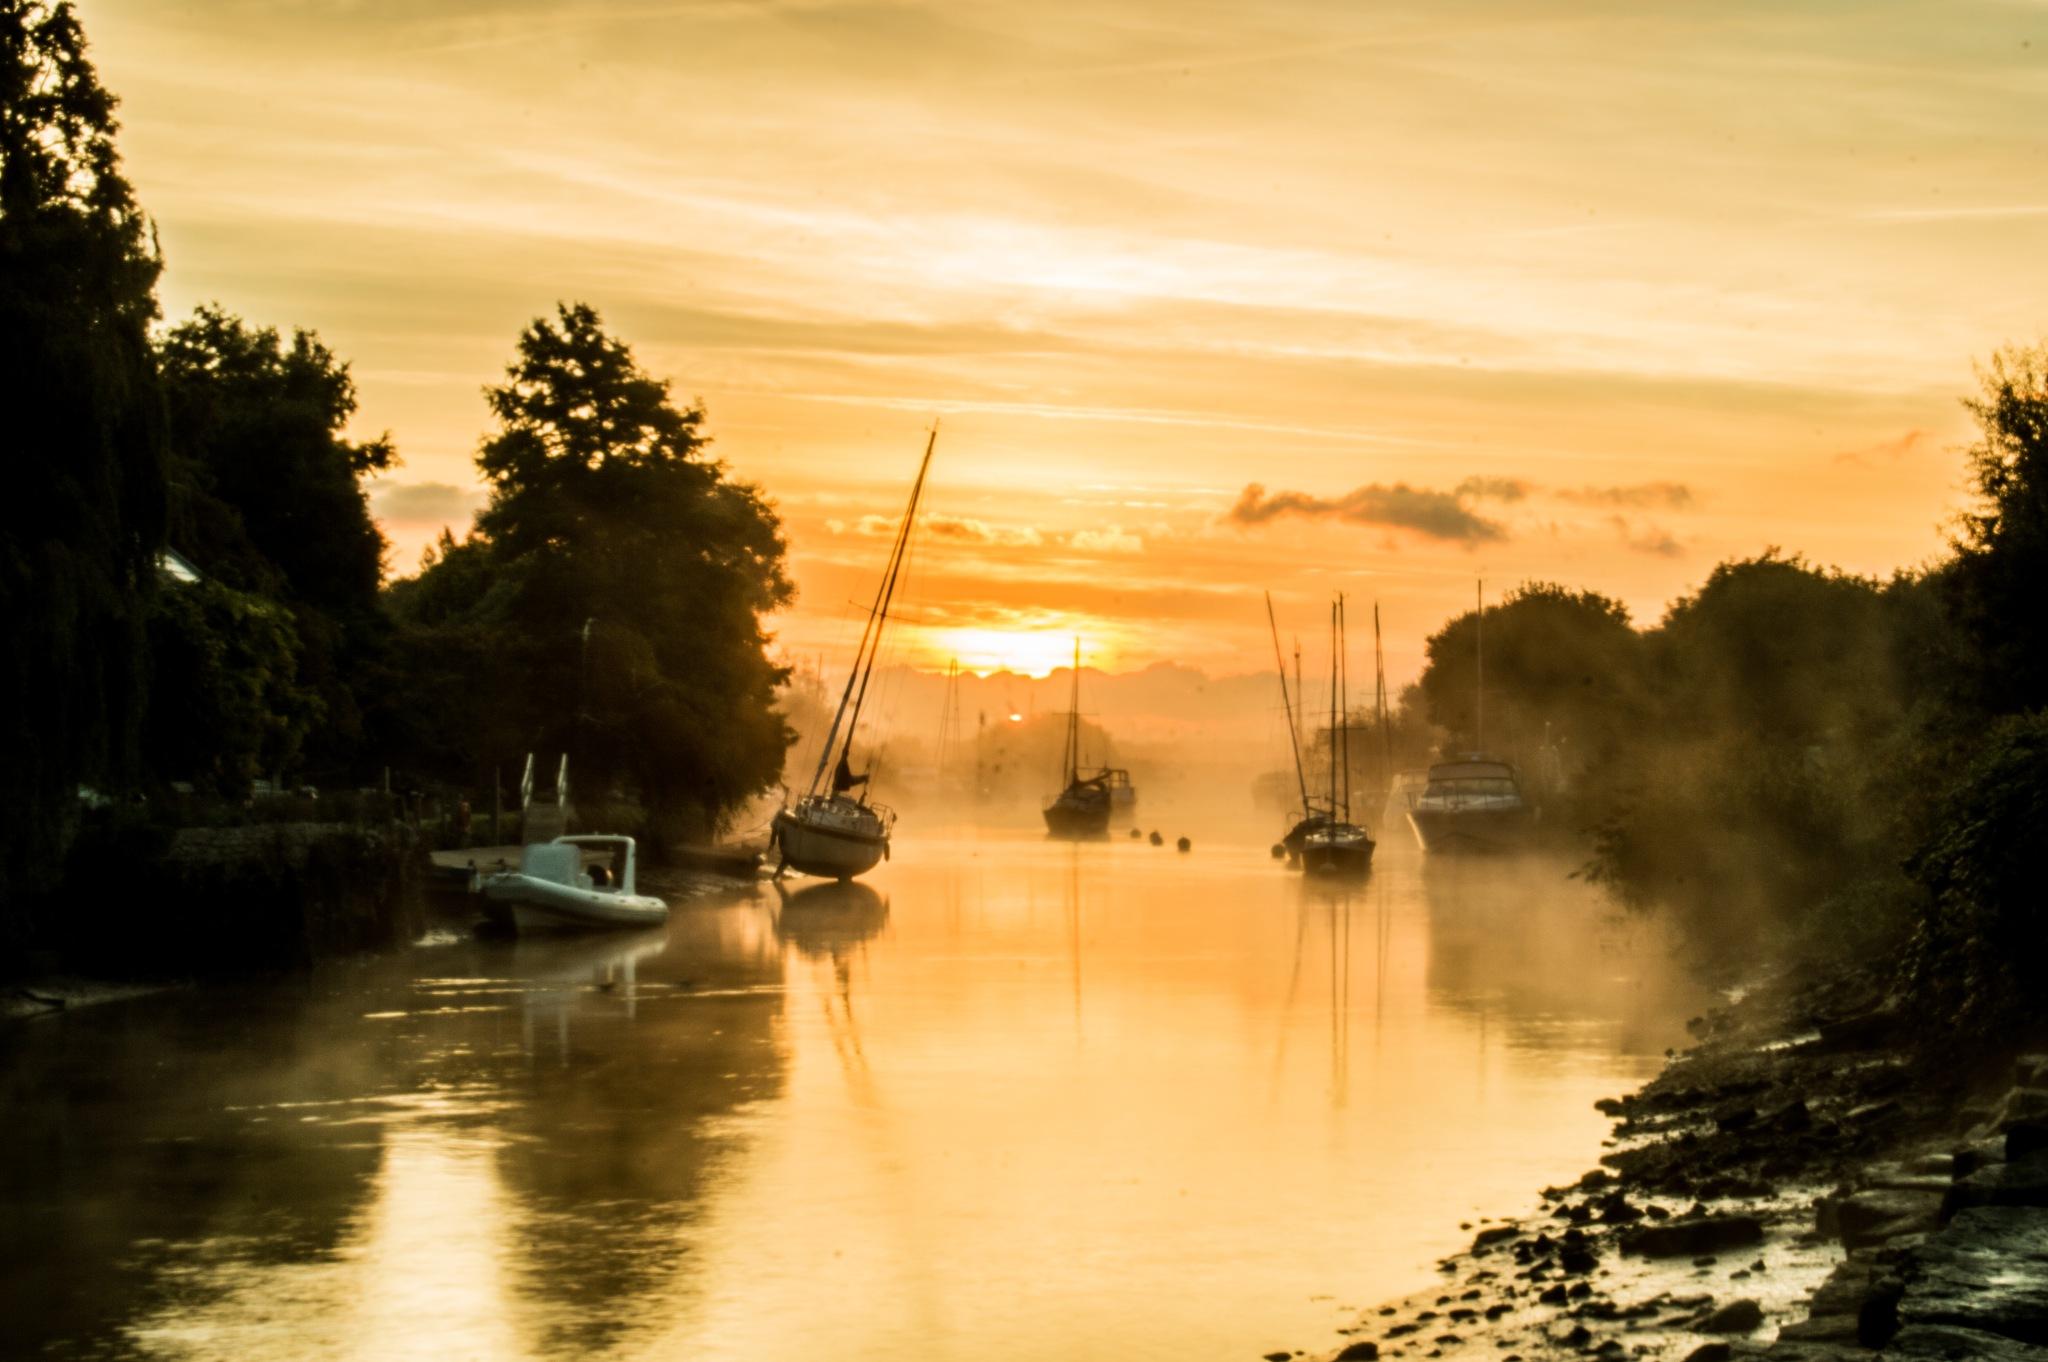 Sunrise at Wareham by richard.murgatroyd2